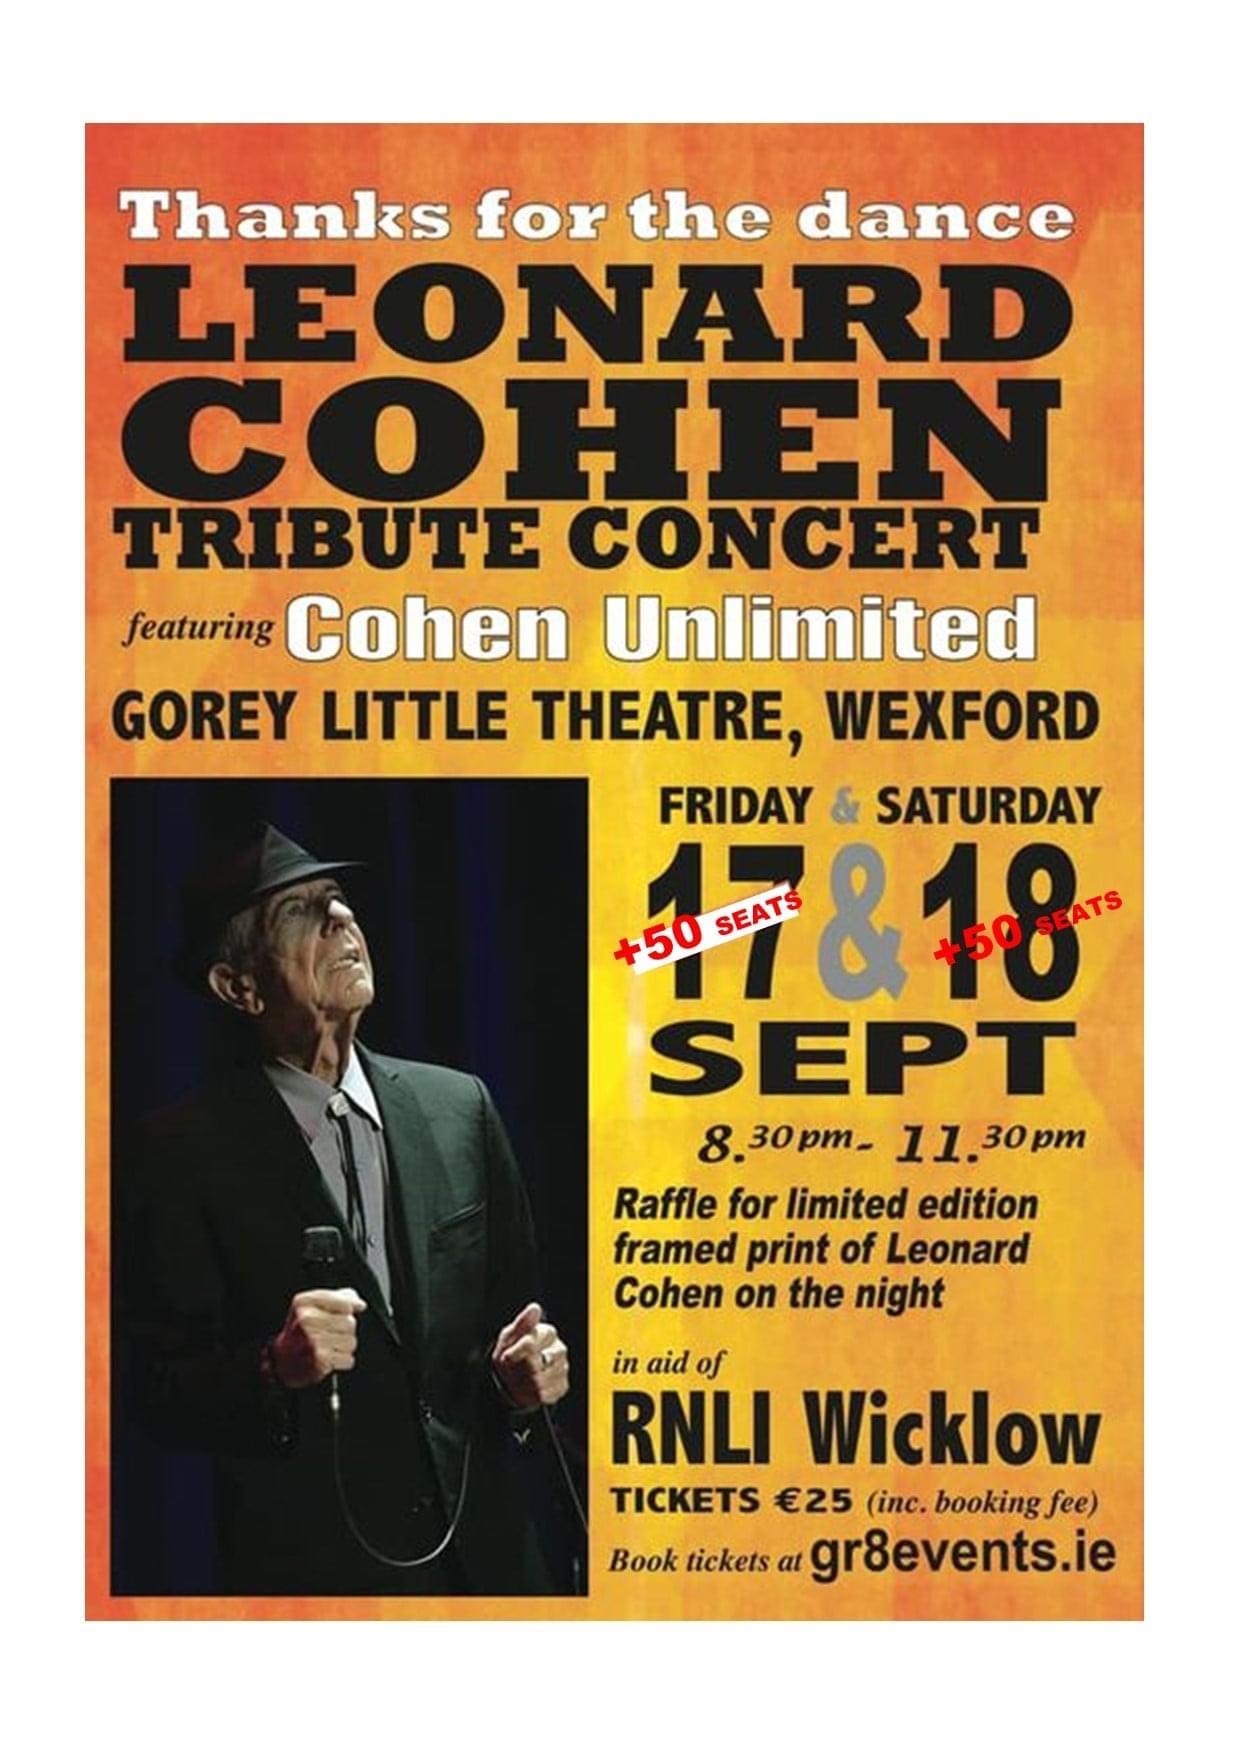 leonard cohen sept gorey little theatre